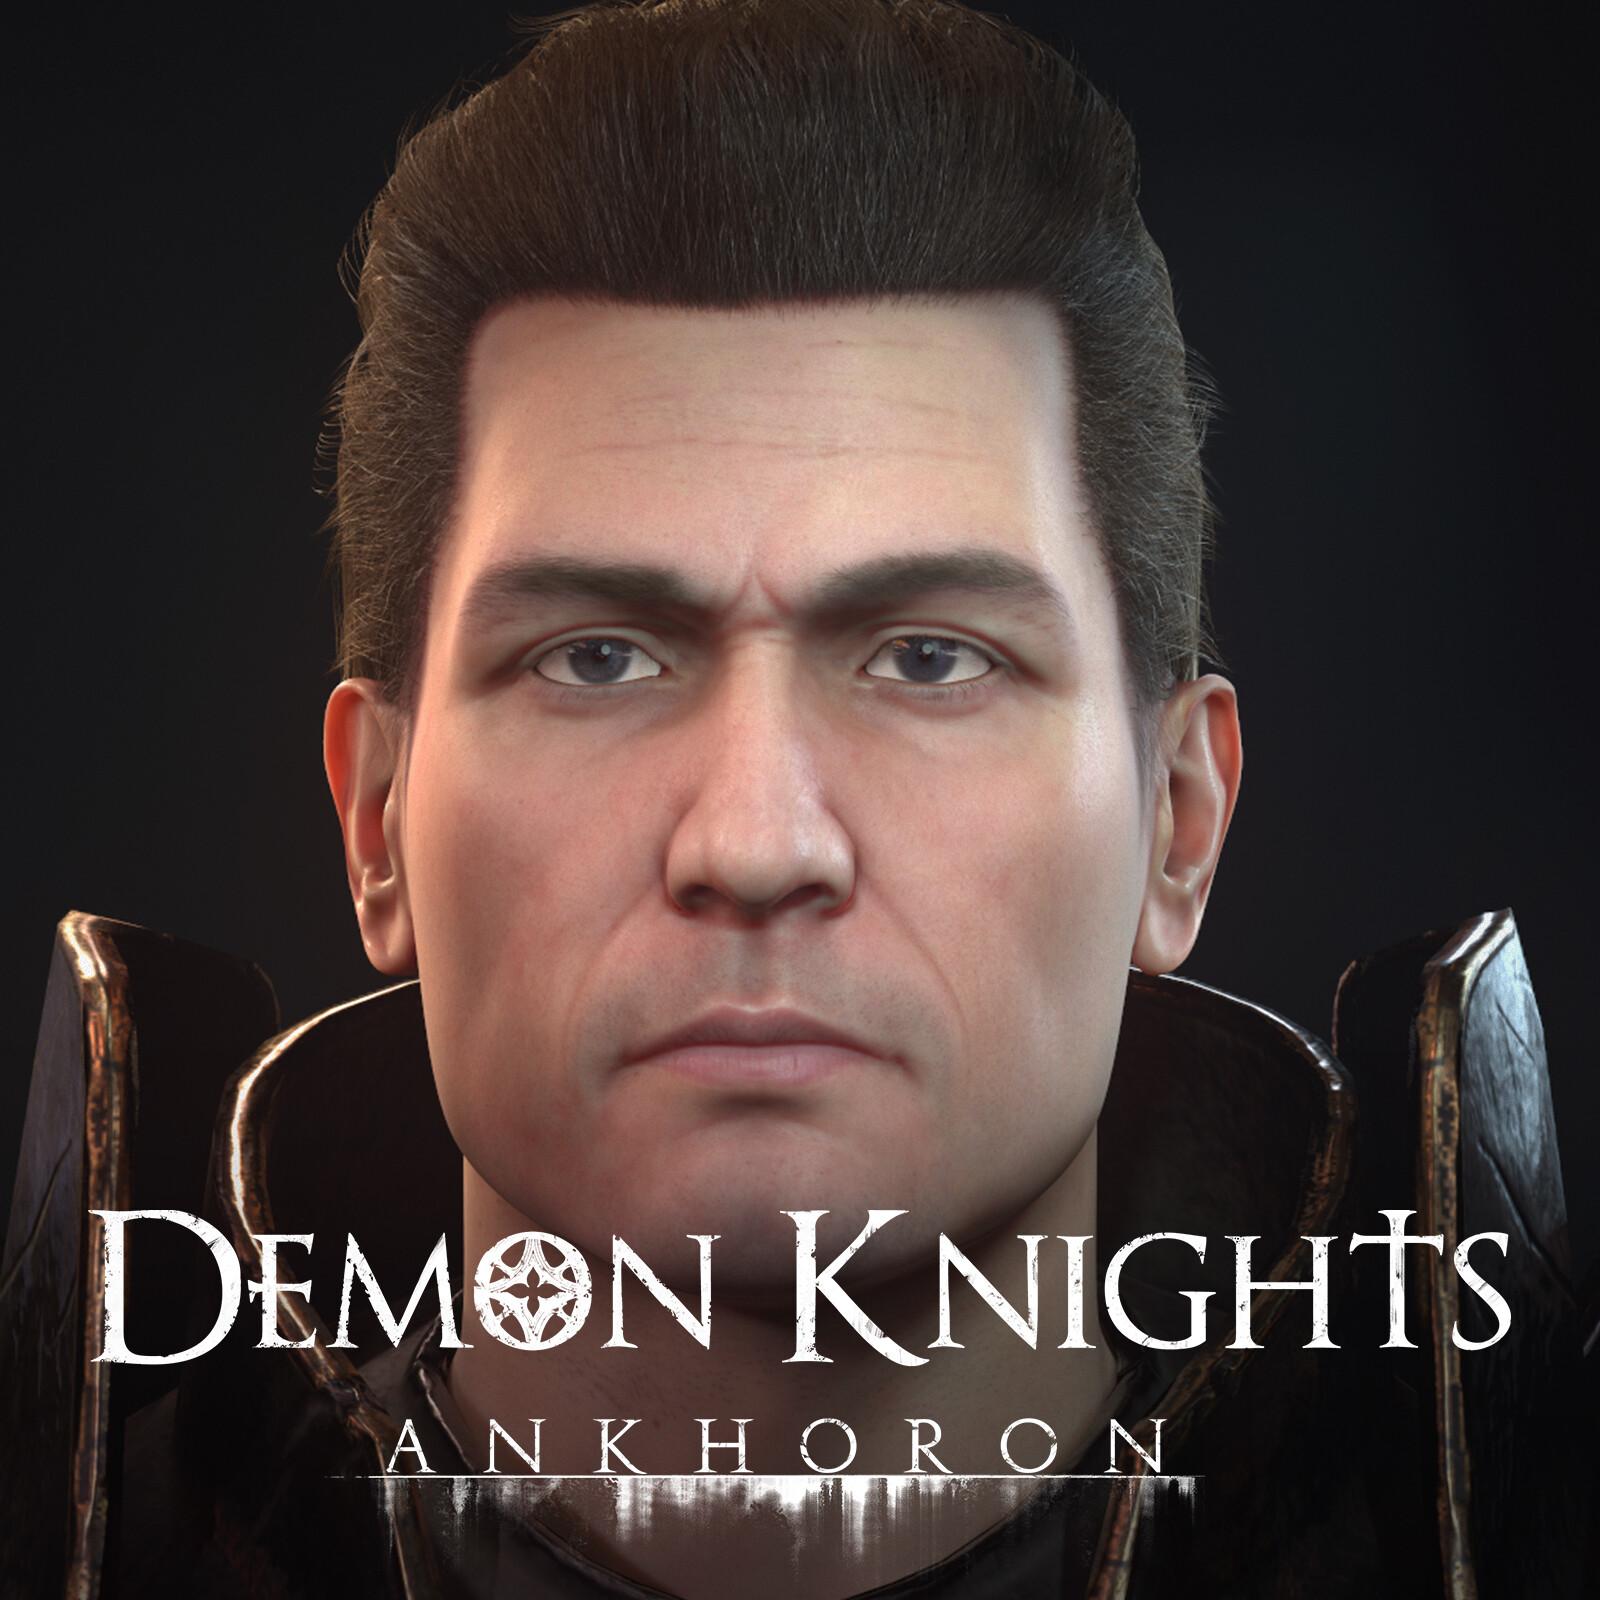 Hero Knight - Demon Knight of Ankhoron